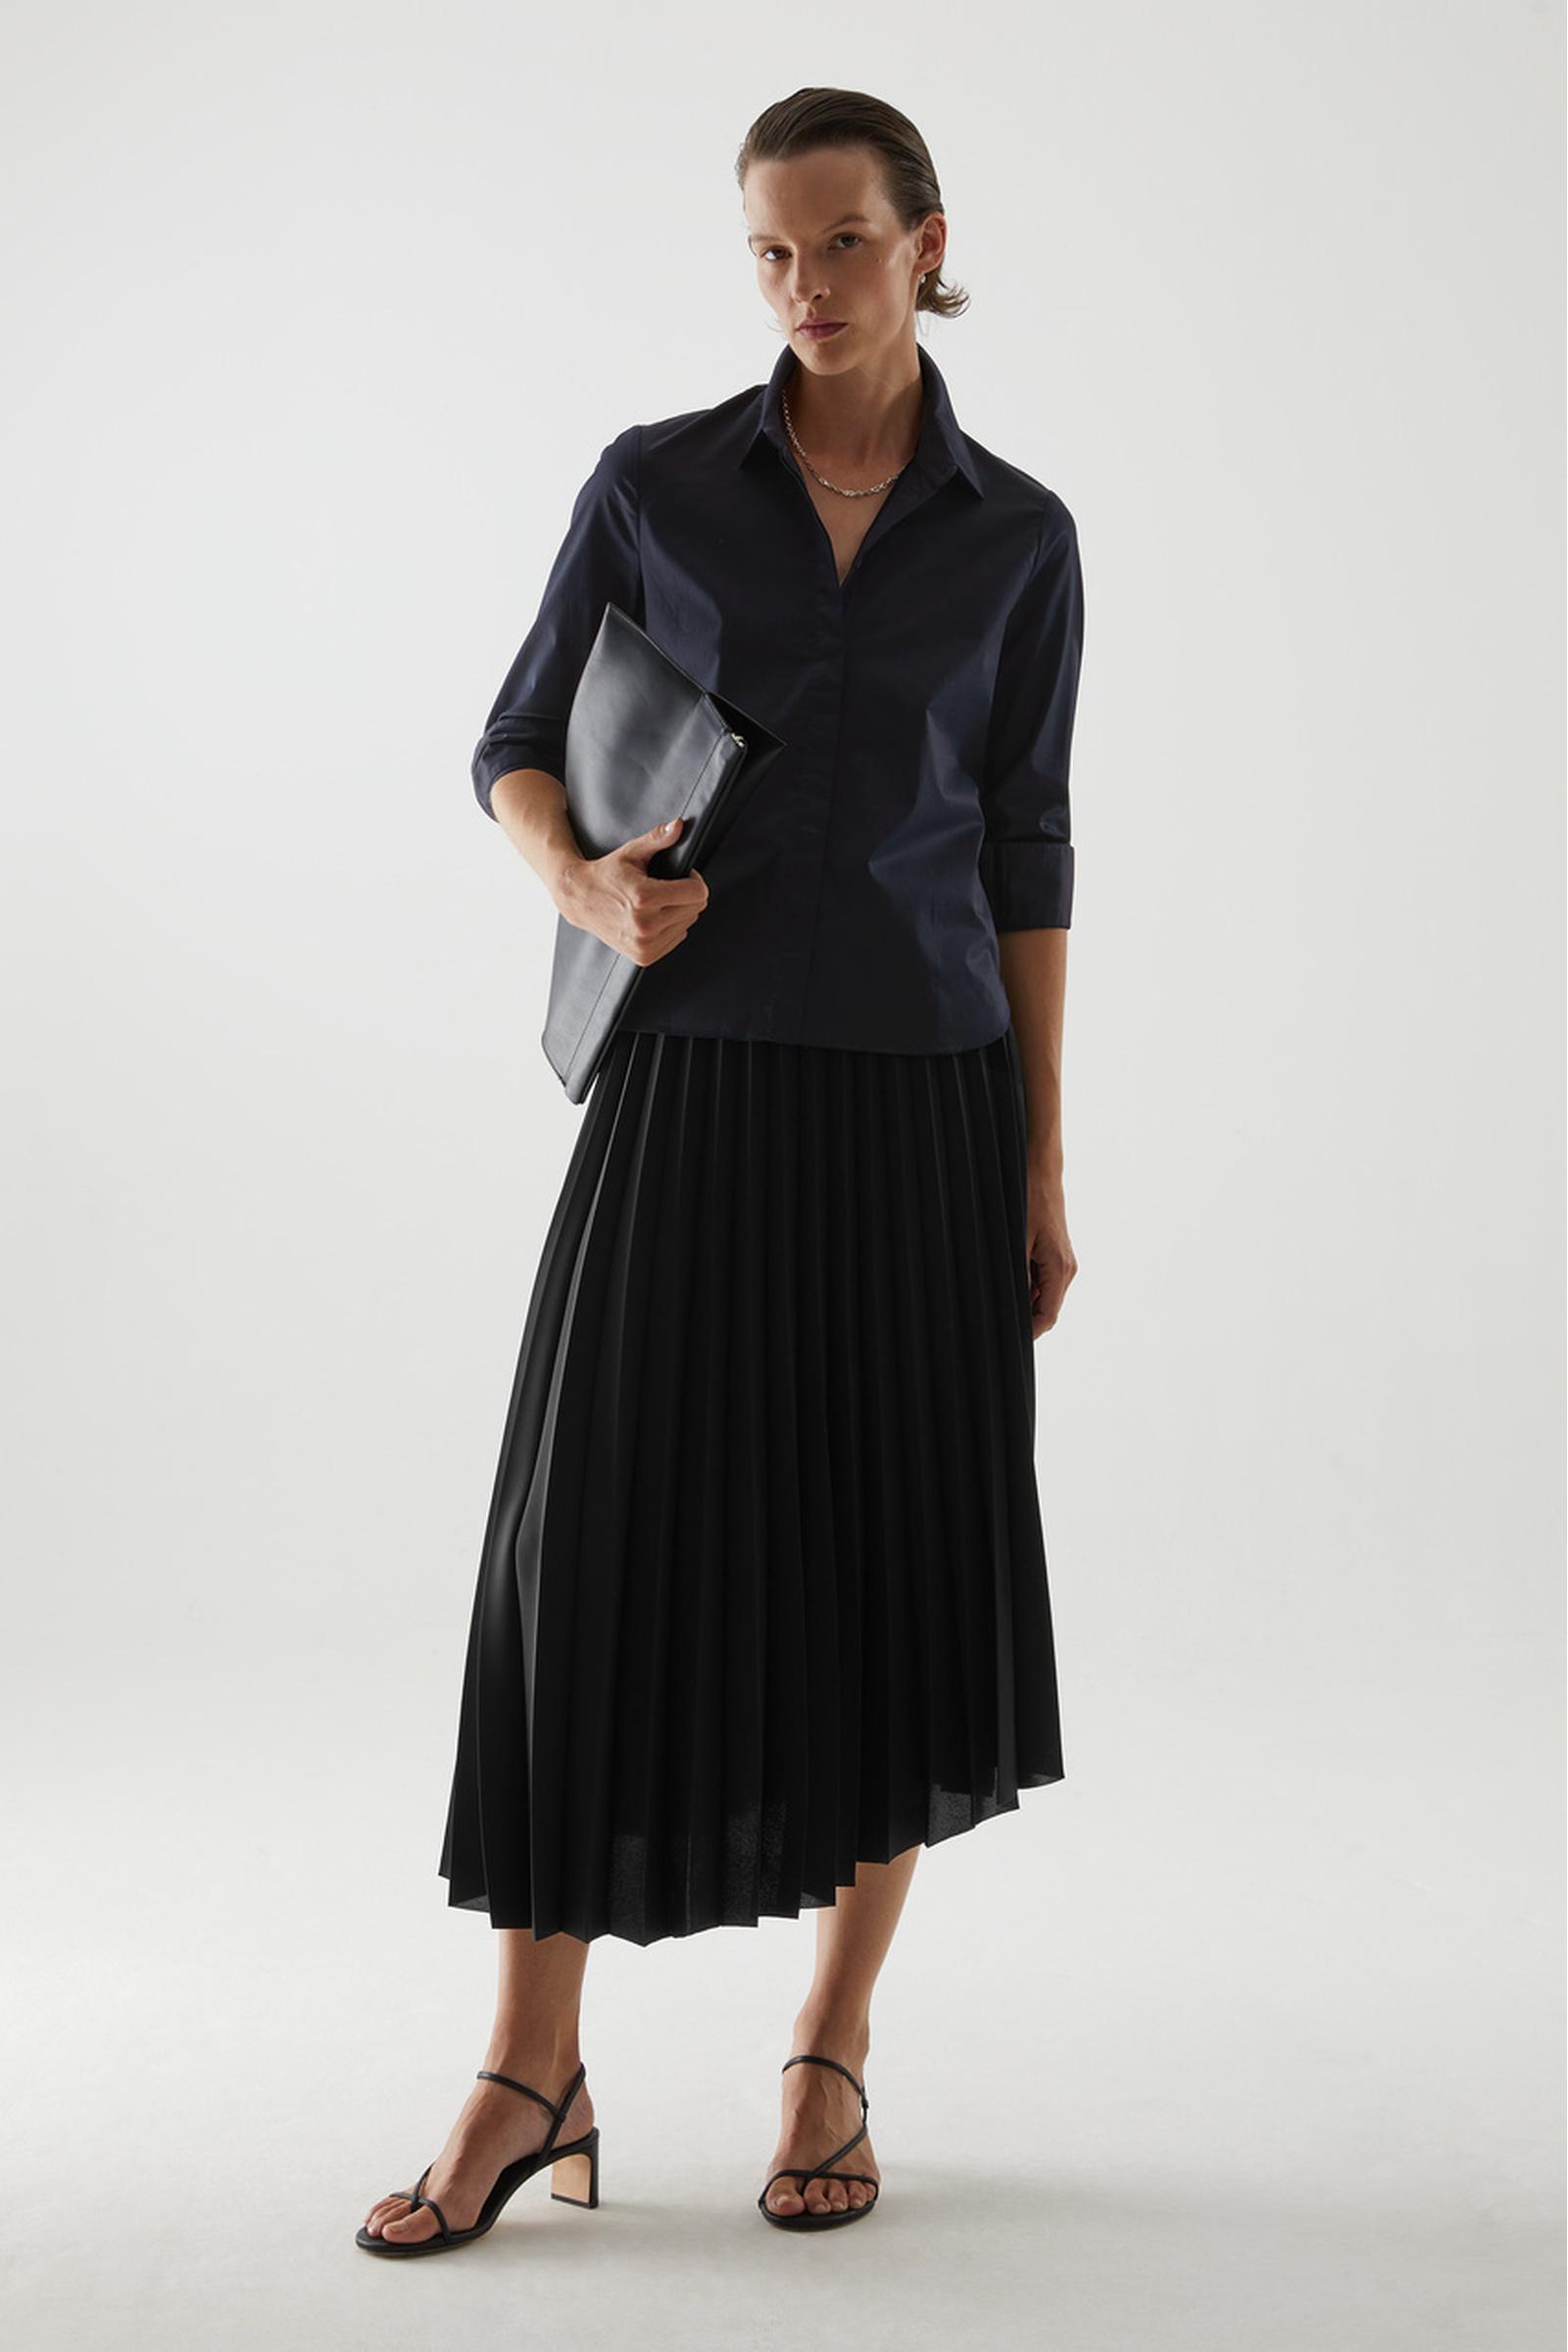 COS 코튼 슬림 핏 셔츠의 블루컬러 ECOMLook입니다.